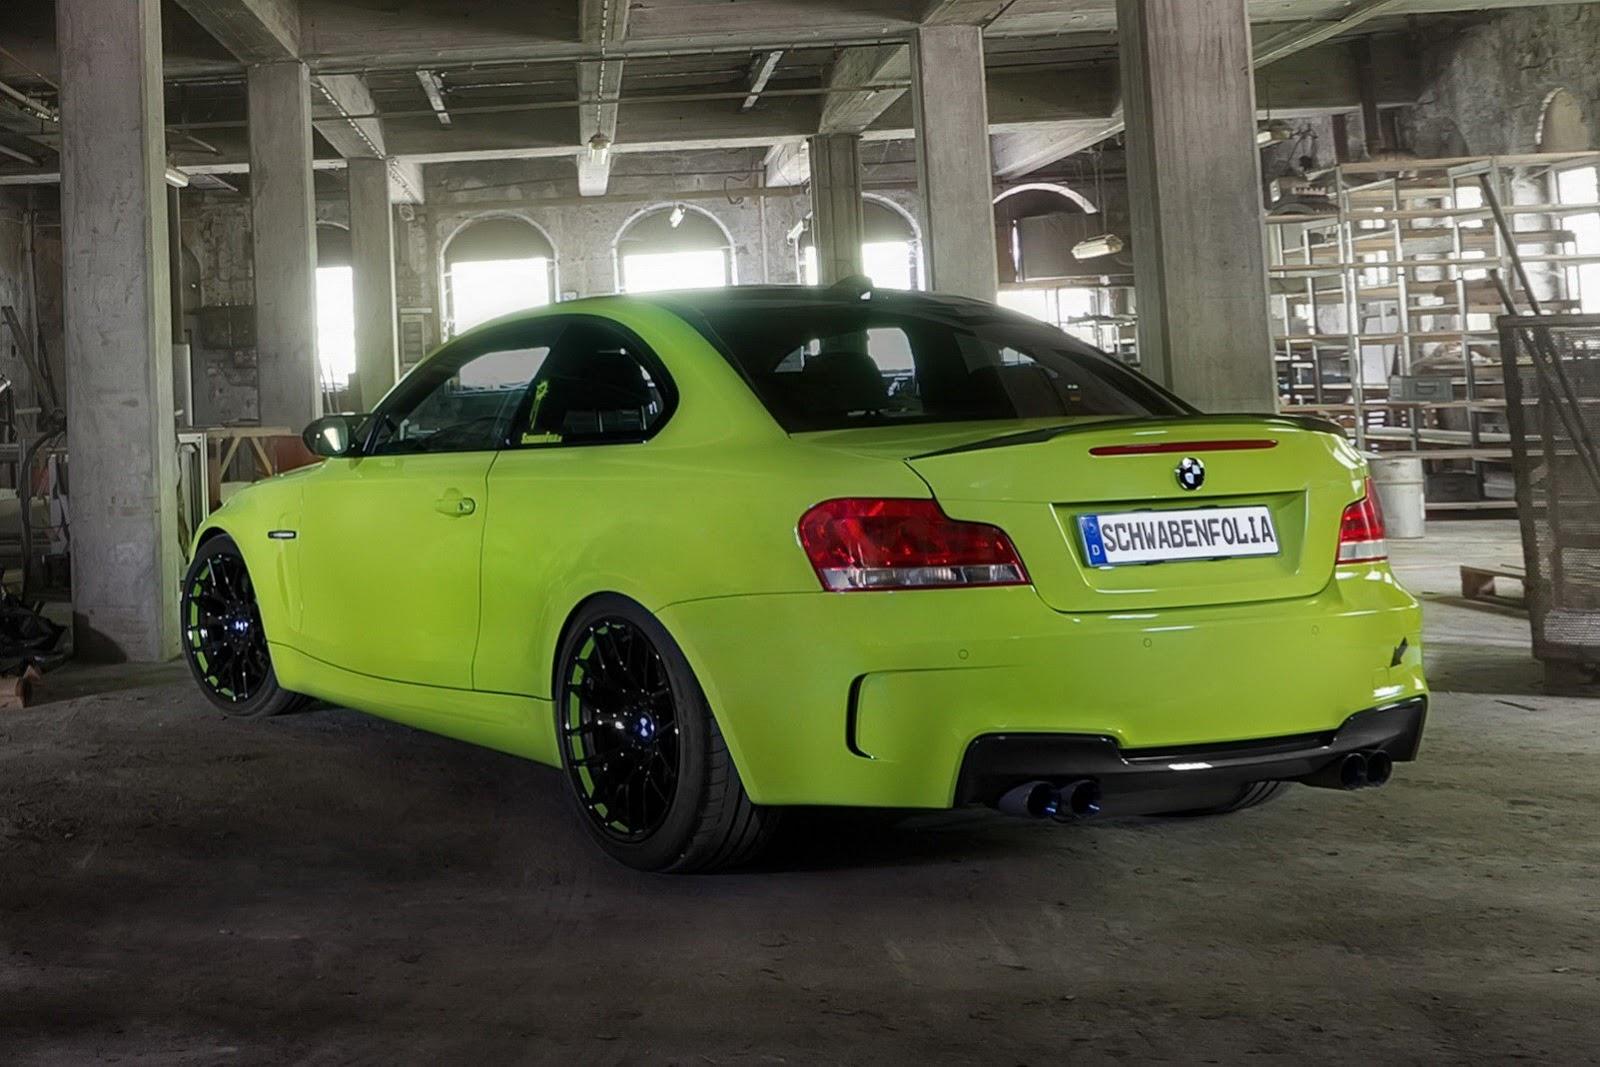 BMW 1 Series M Coupe by Schwabenfolia